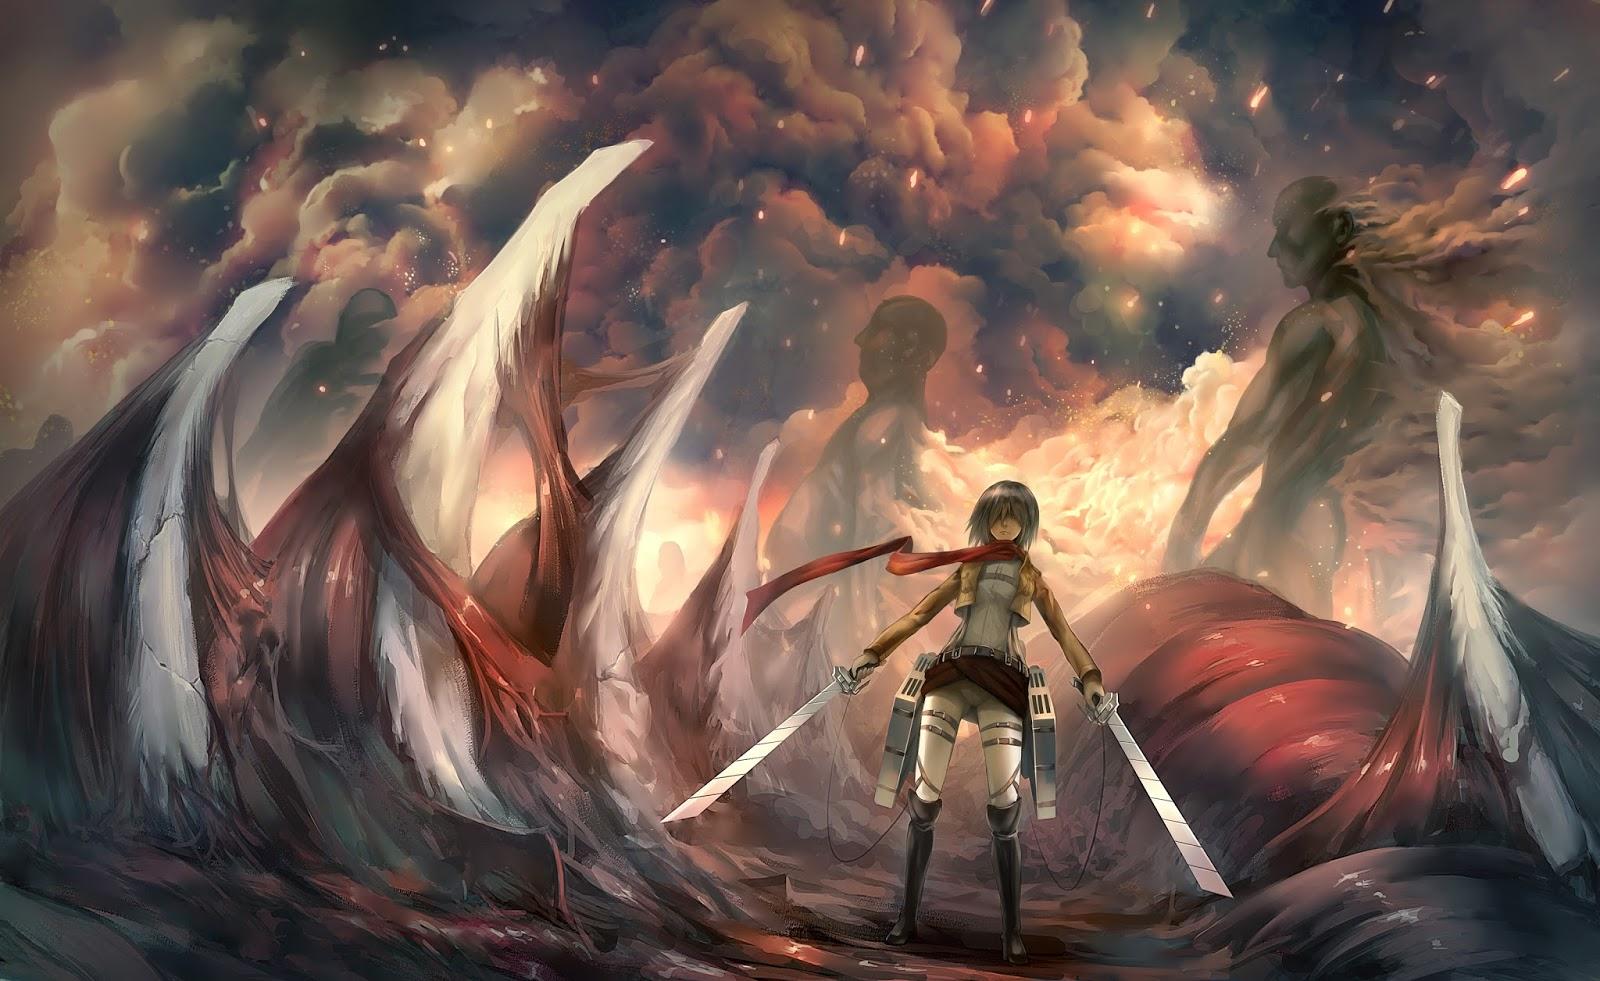 Unduh 7000+ Wallpaper Anime Epic Hd HD Gratis